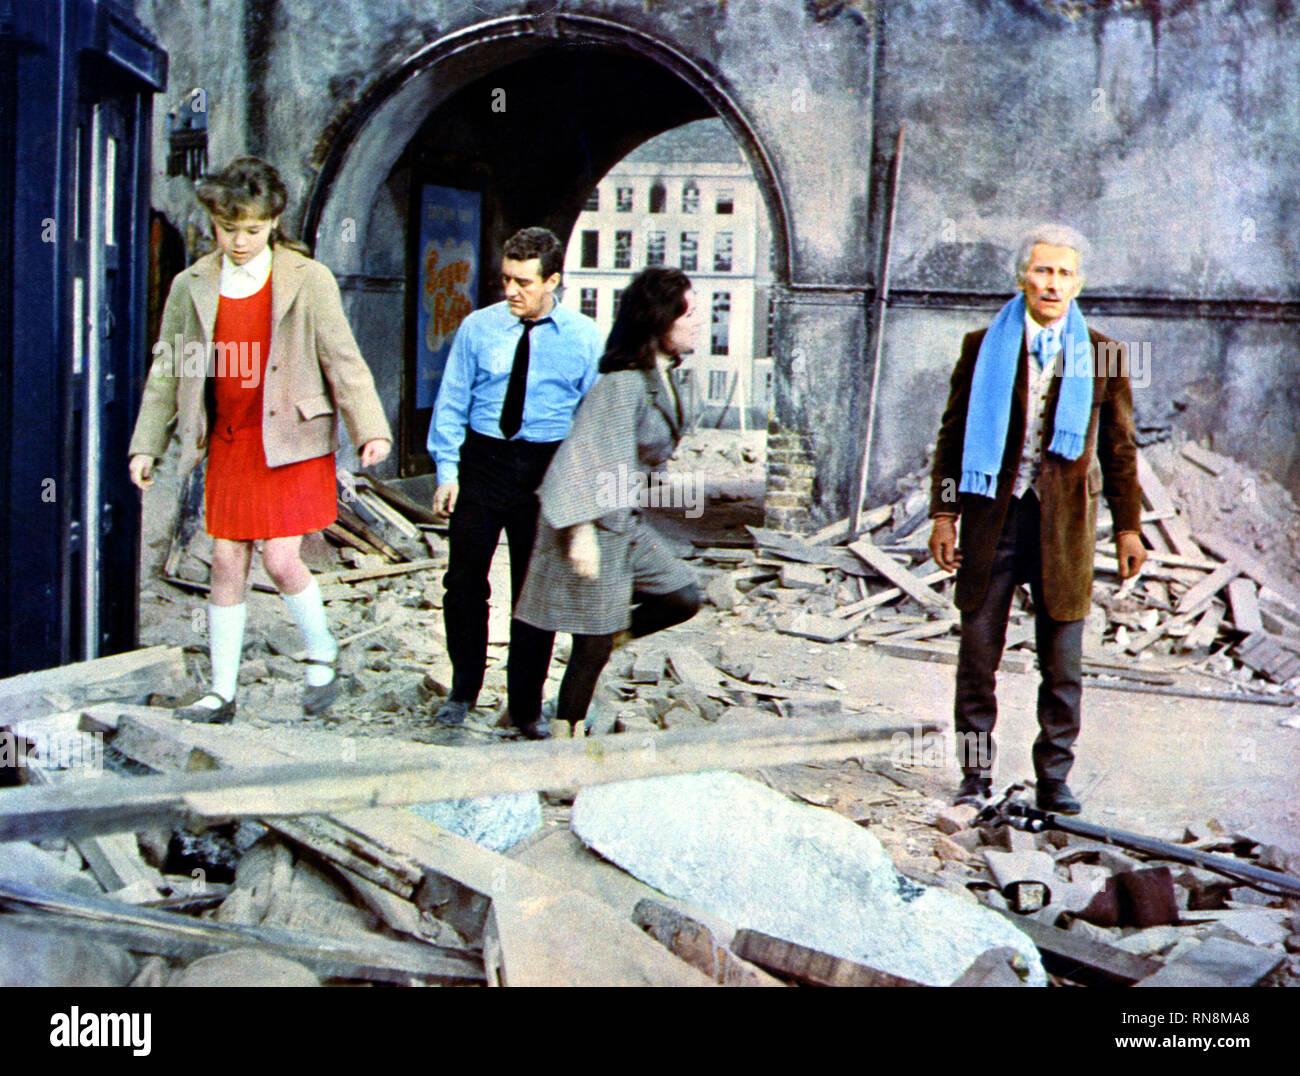 ROBERTA TOVEY, BERNARD CRIBBINS, JILL CURZON,PETER CUSHING, DR WHO  DALEKS INVASION EARTH 2150 AD, 1966 - Stock Image